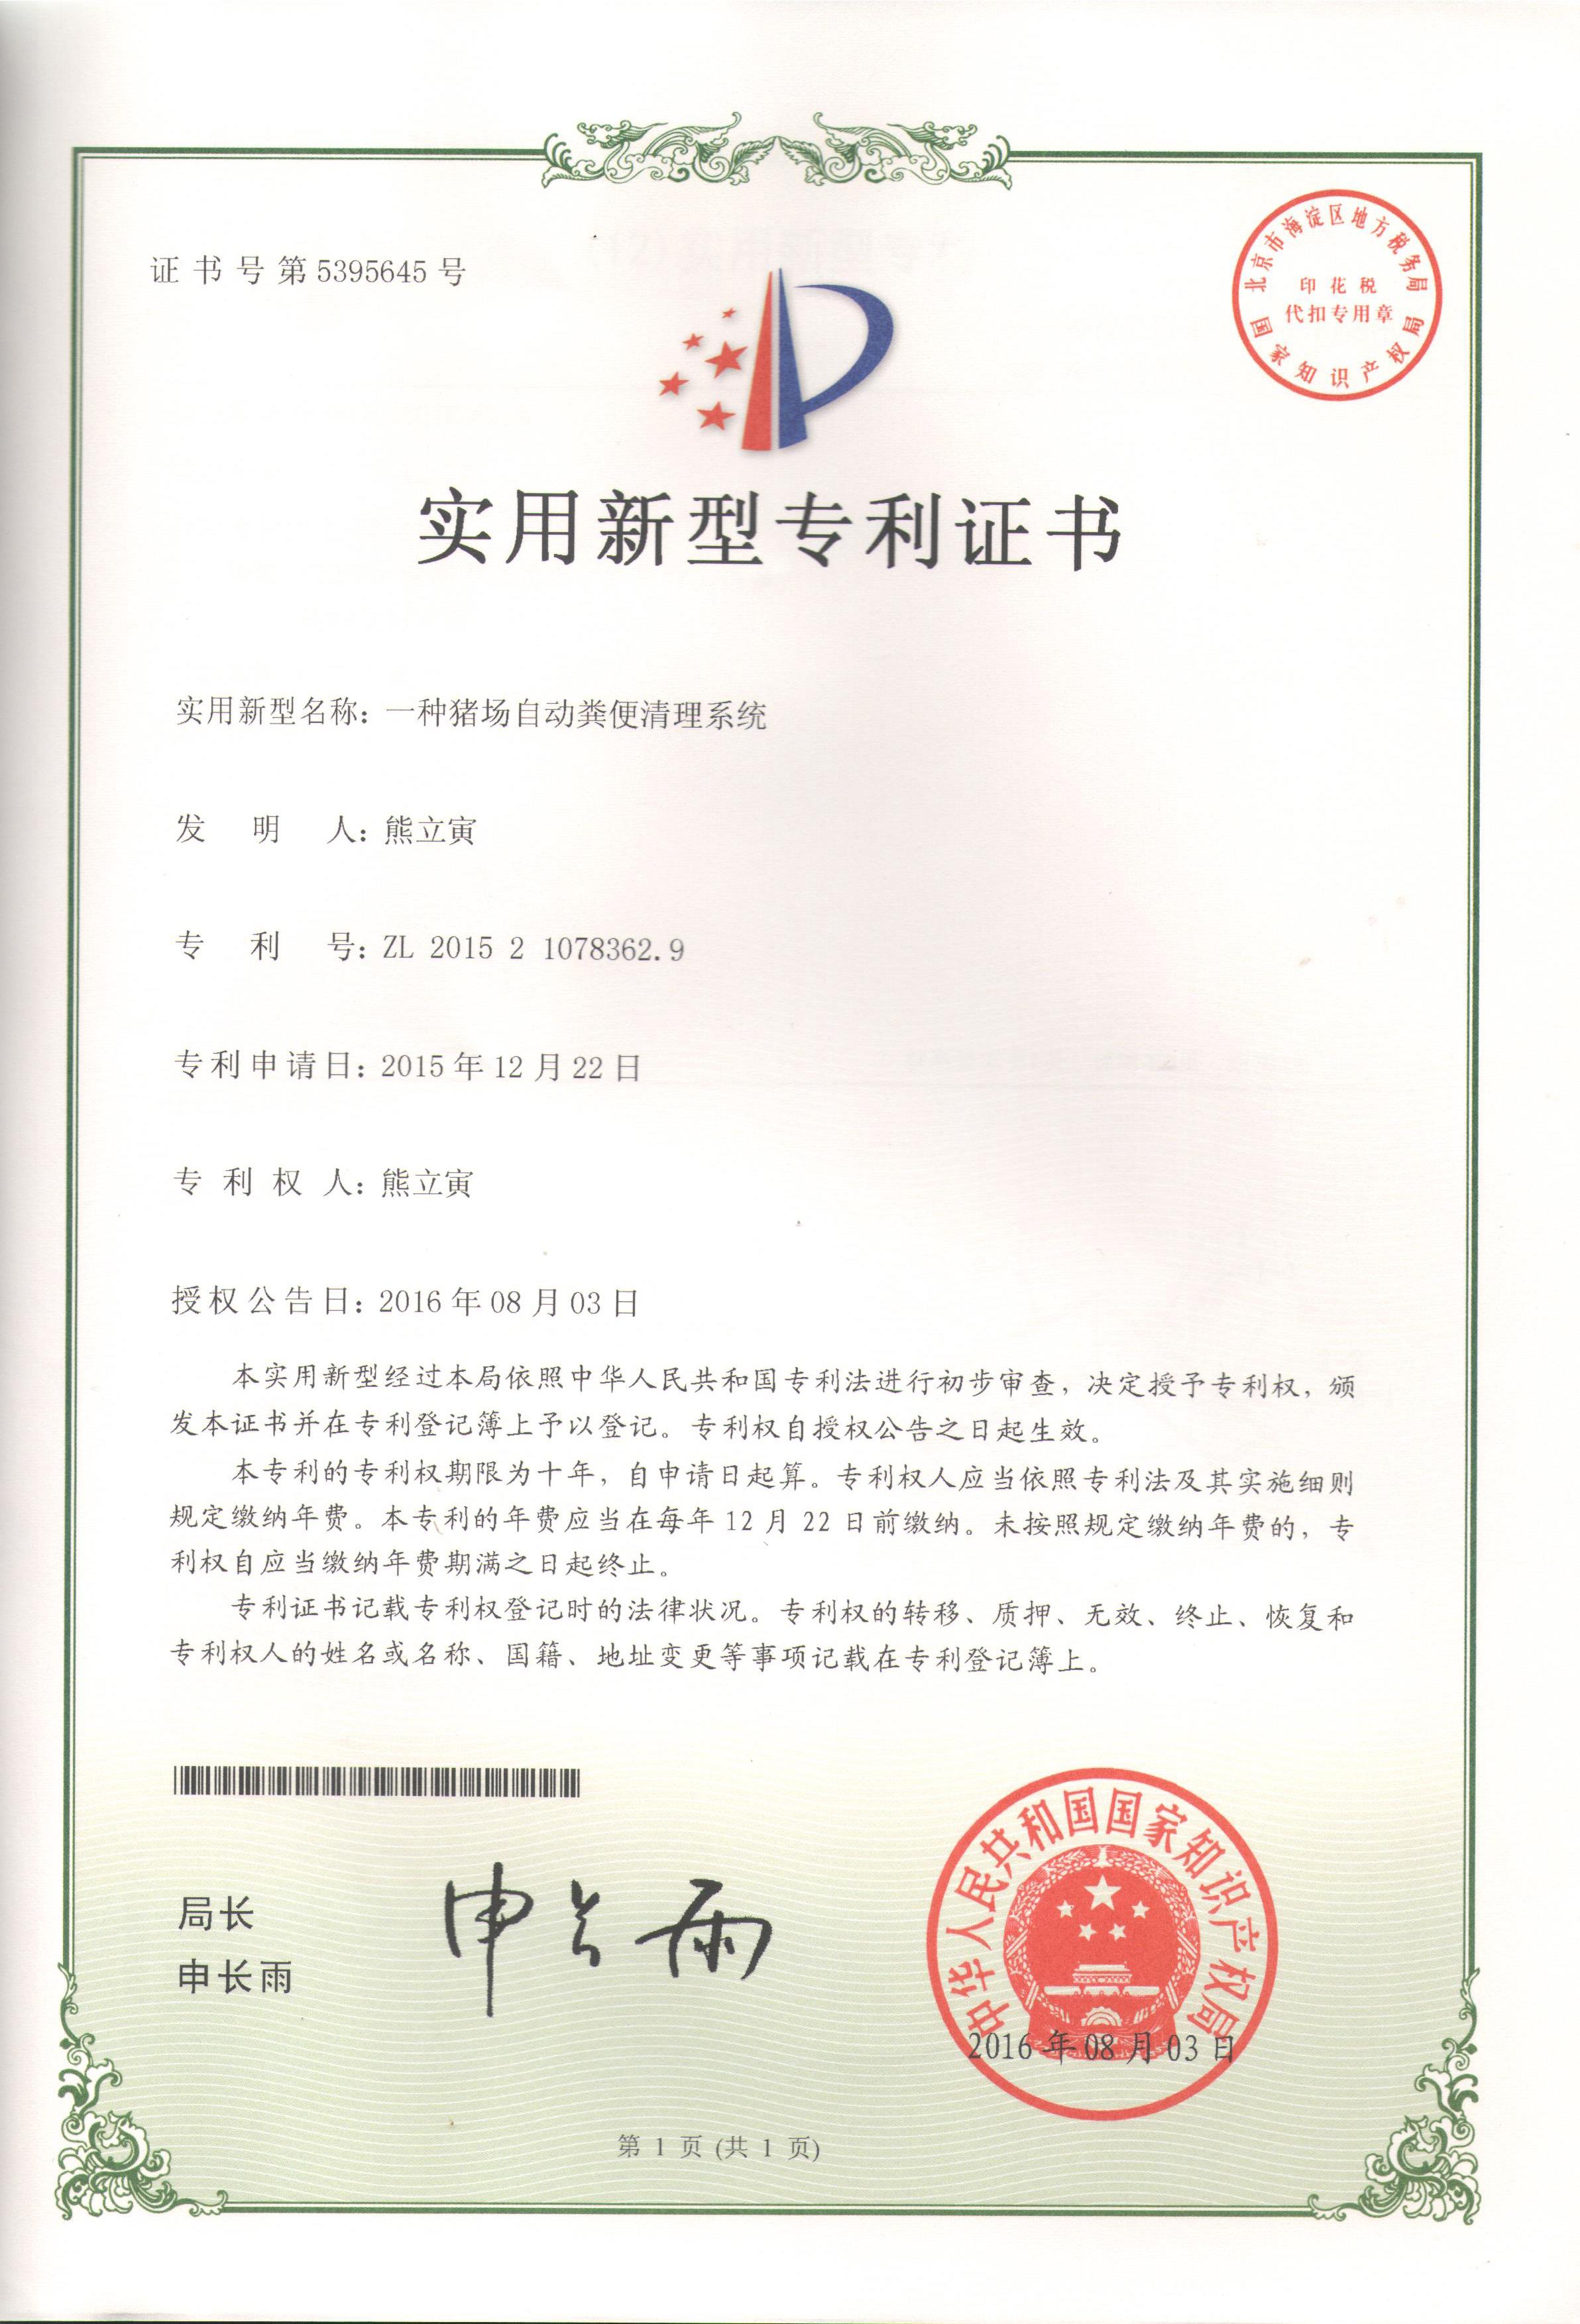 ZL201521078362.9一種豬場自動糞便清理系統1